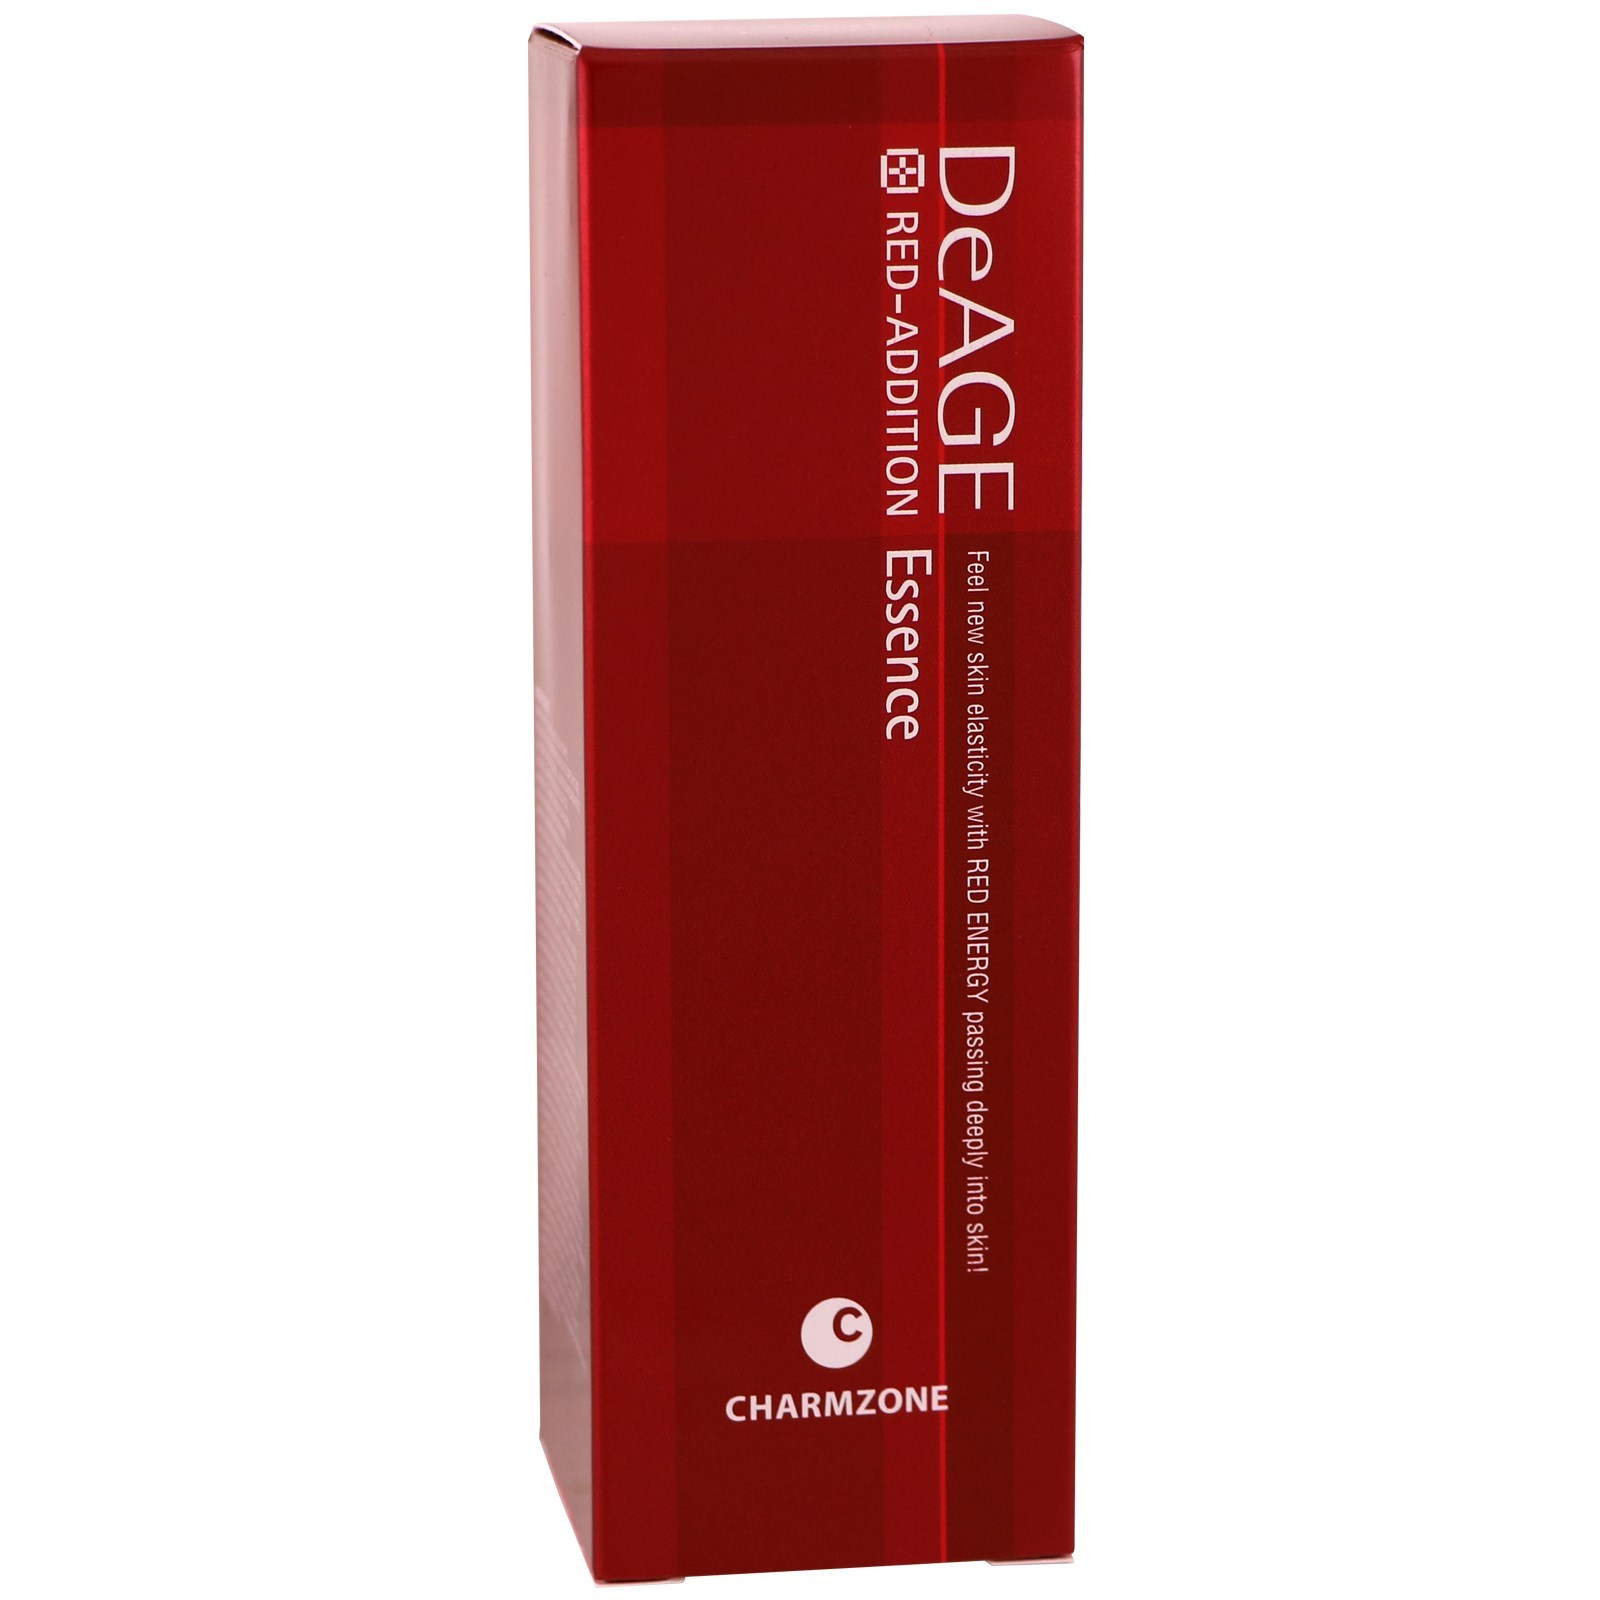 Charmzone, DeAge, Red-Addition, увлажняющая эссенция, 1,69 жидк. унц. (70 мл)